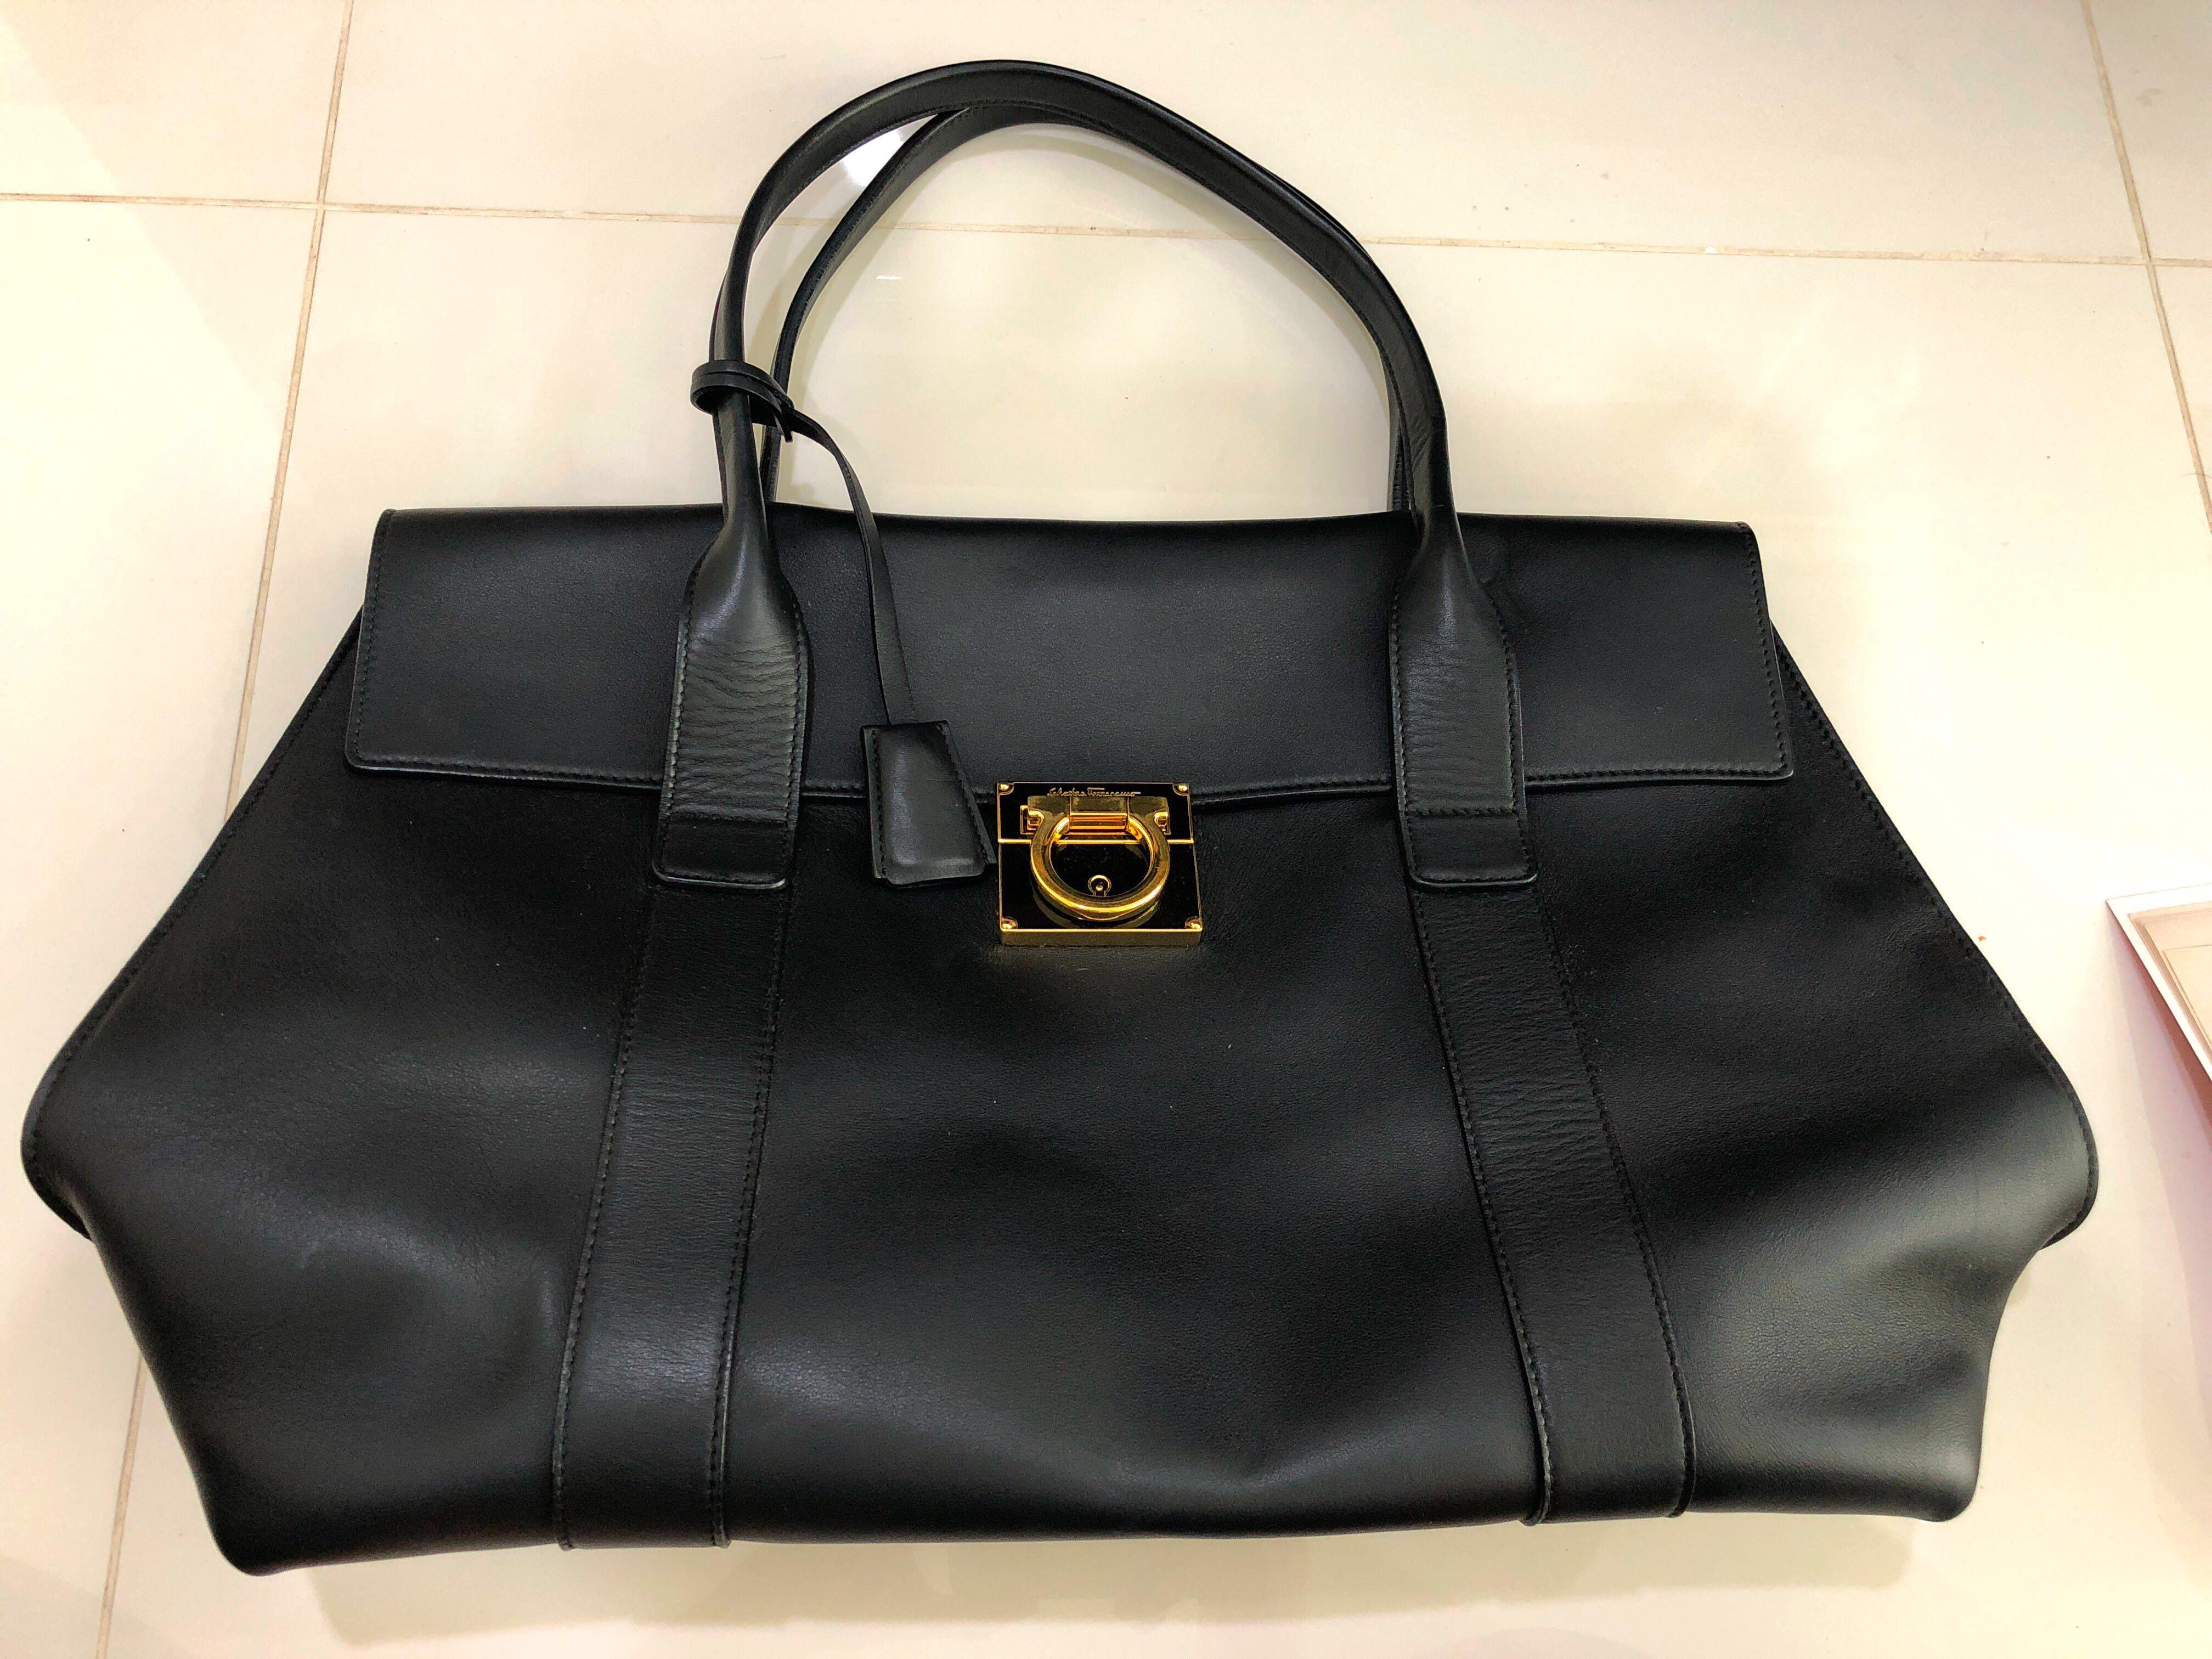 7eab9df30a Full Leather Salvatore Ferragamo handbag